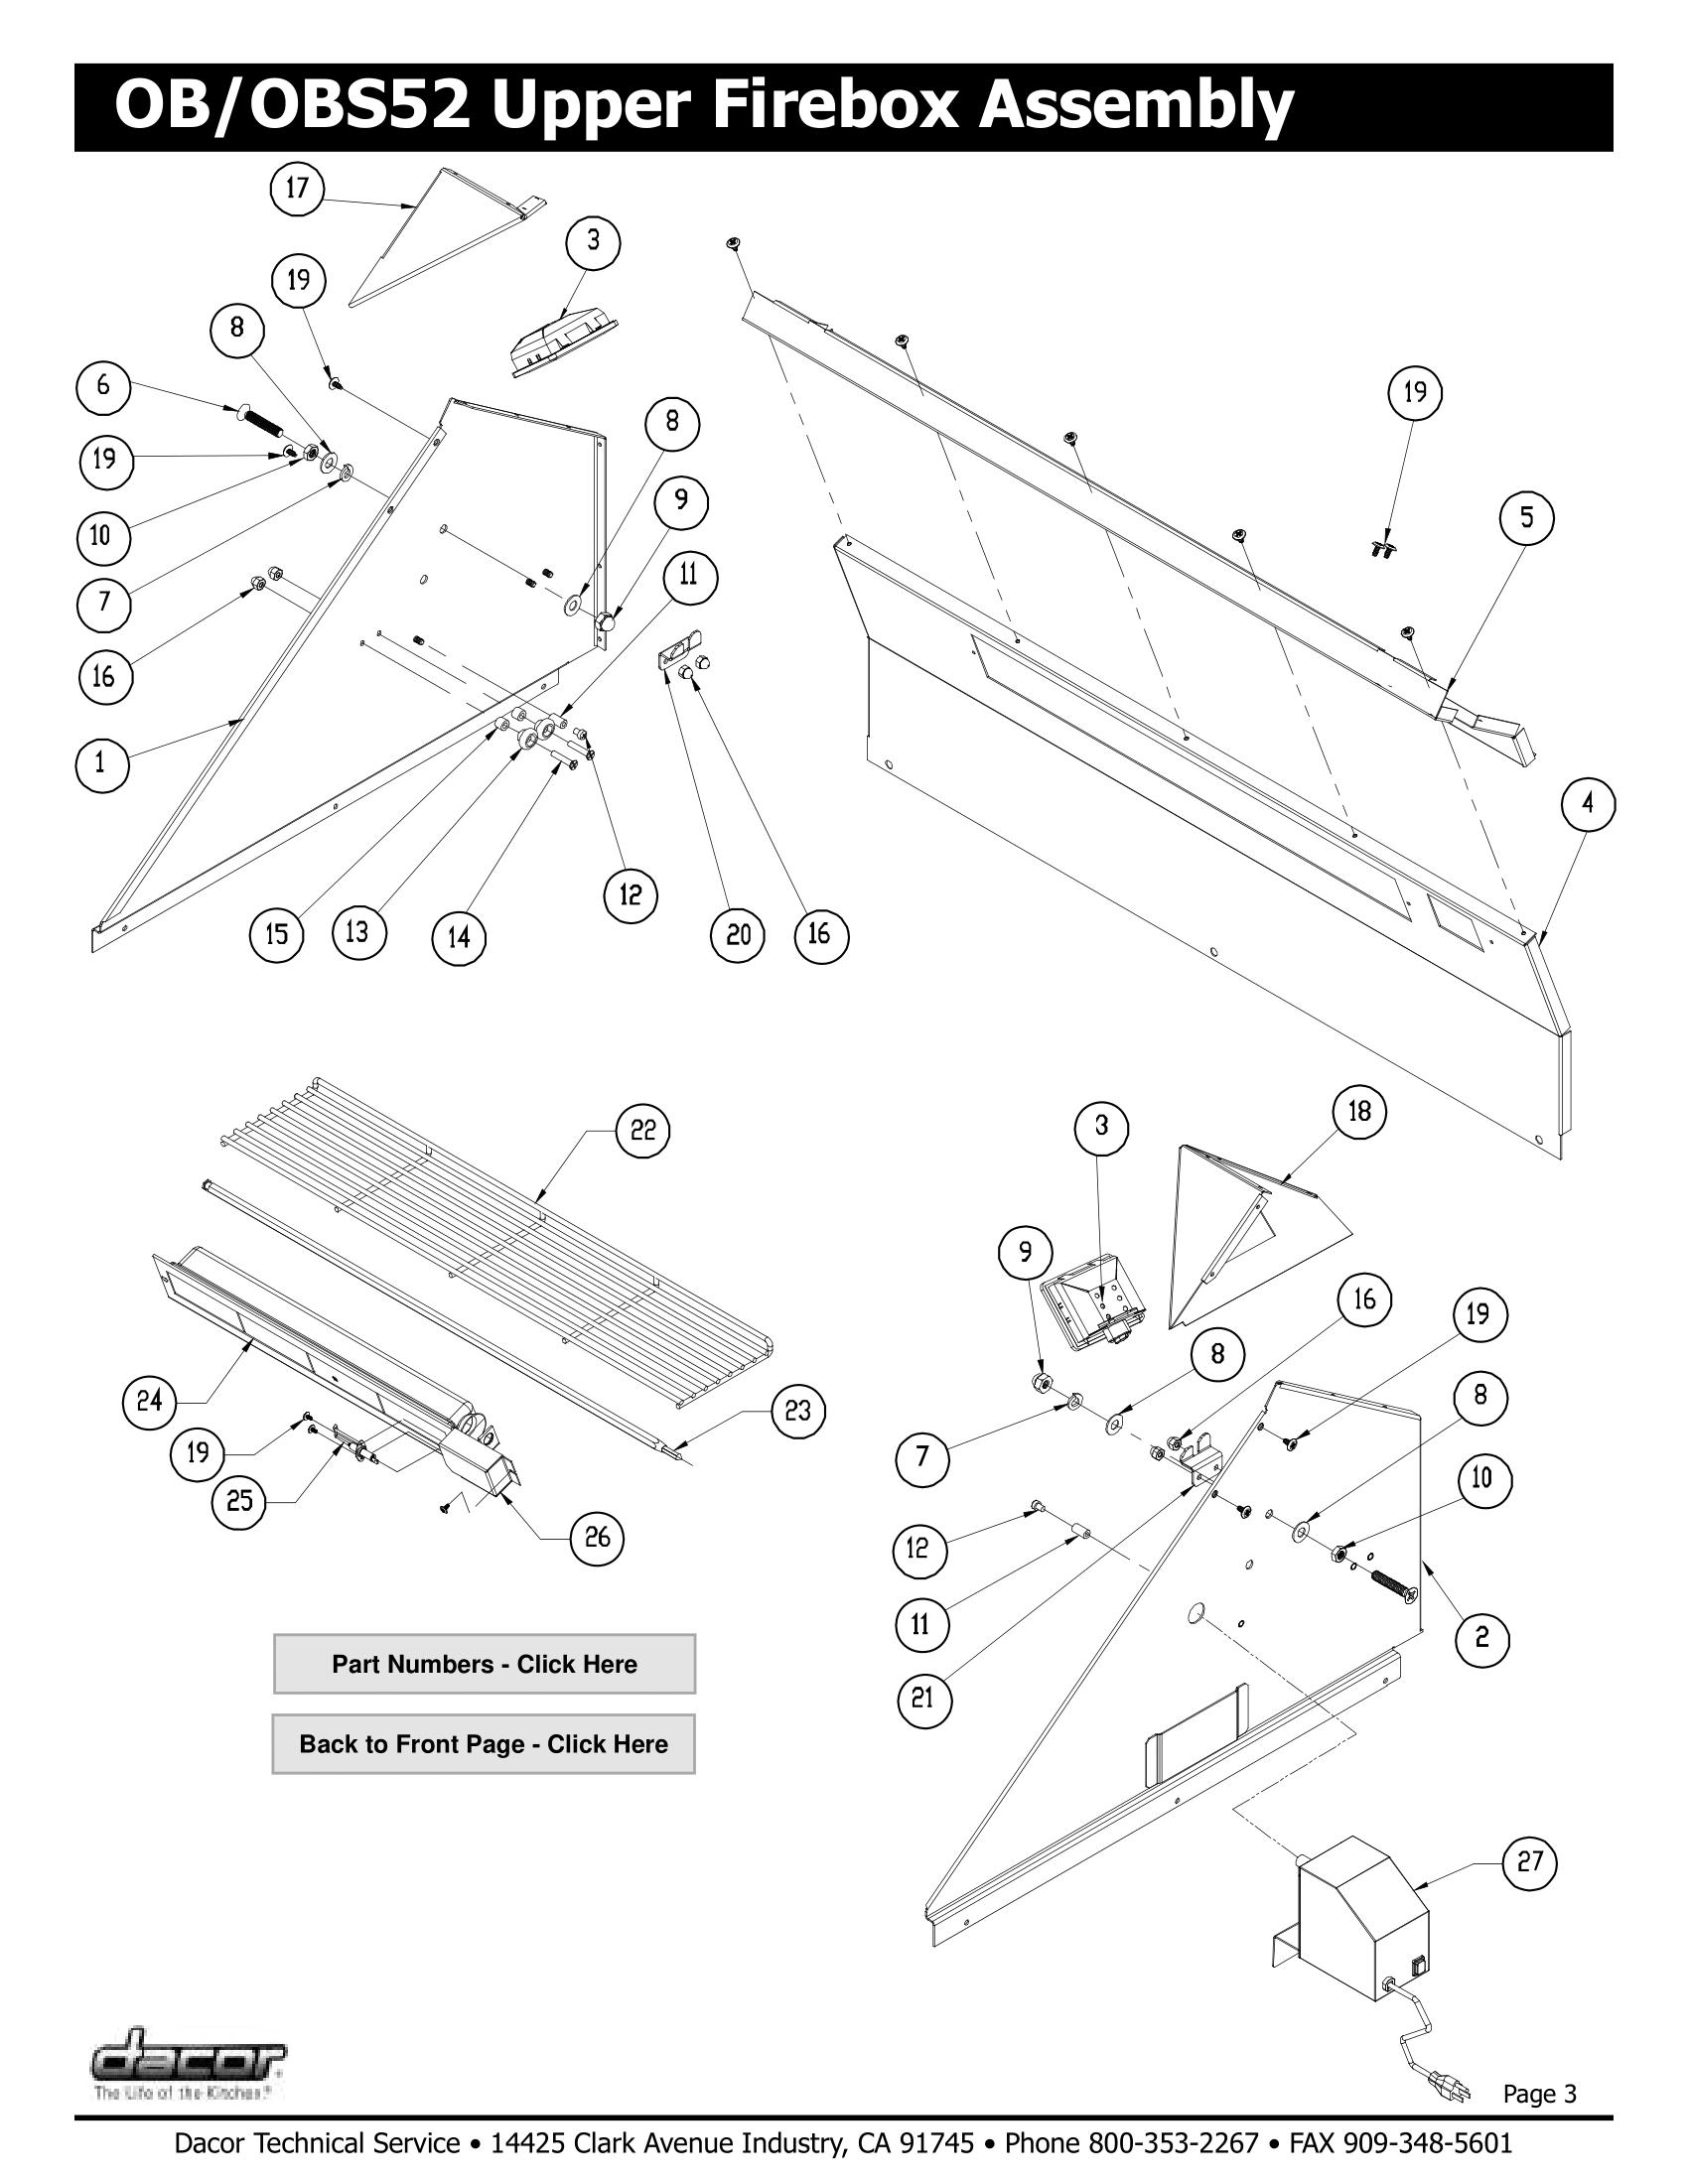 Dacor OBS52 Upper Firebox Assembly Schematic